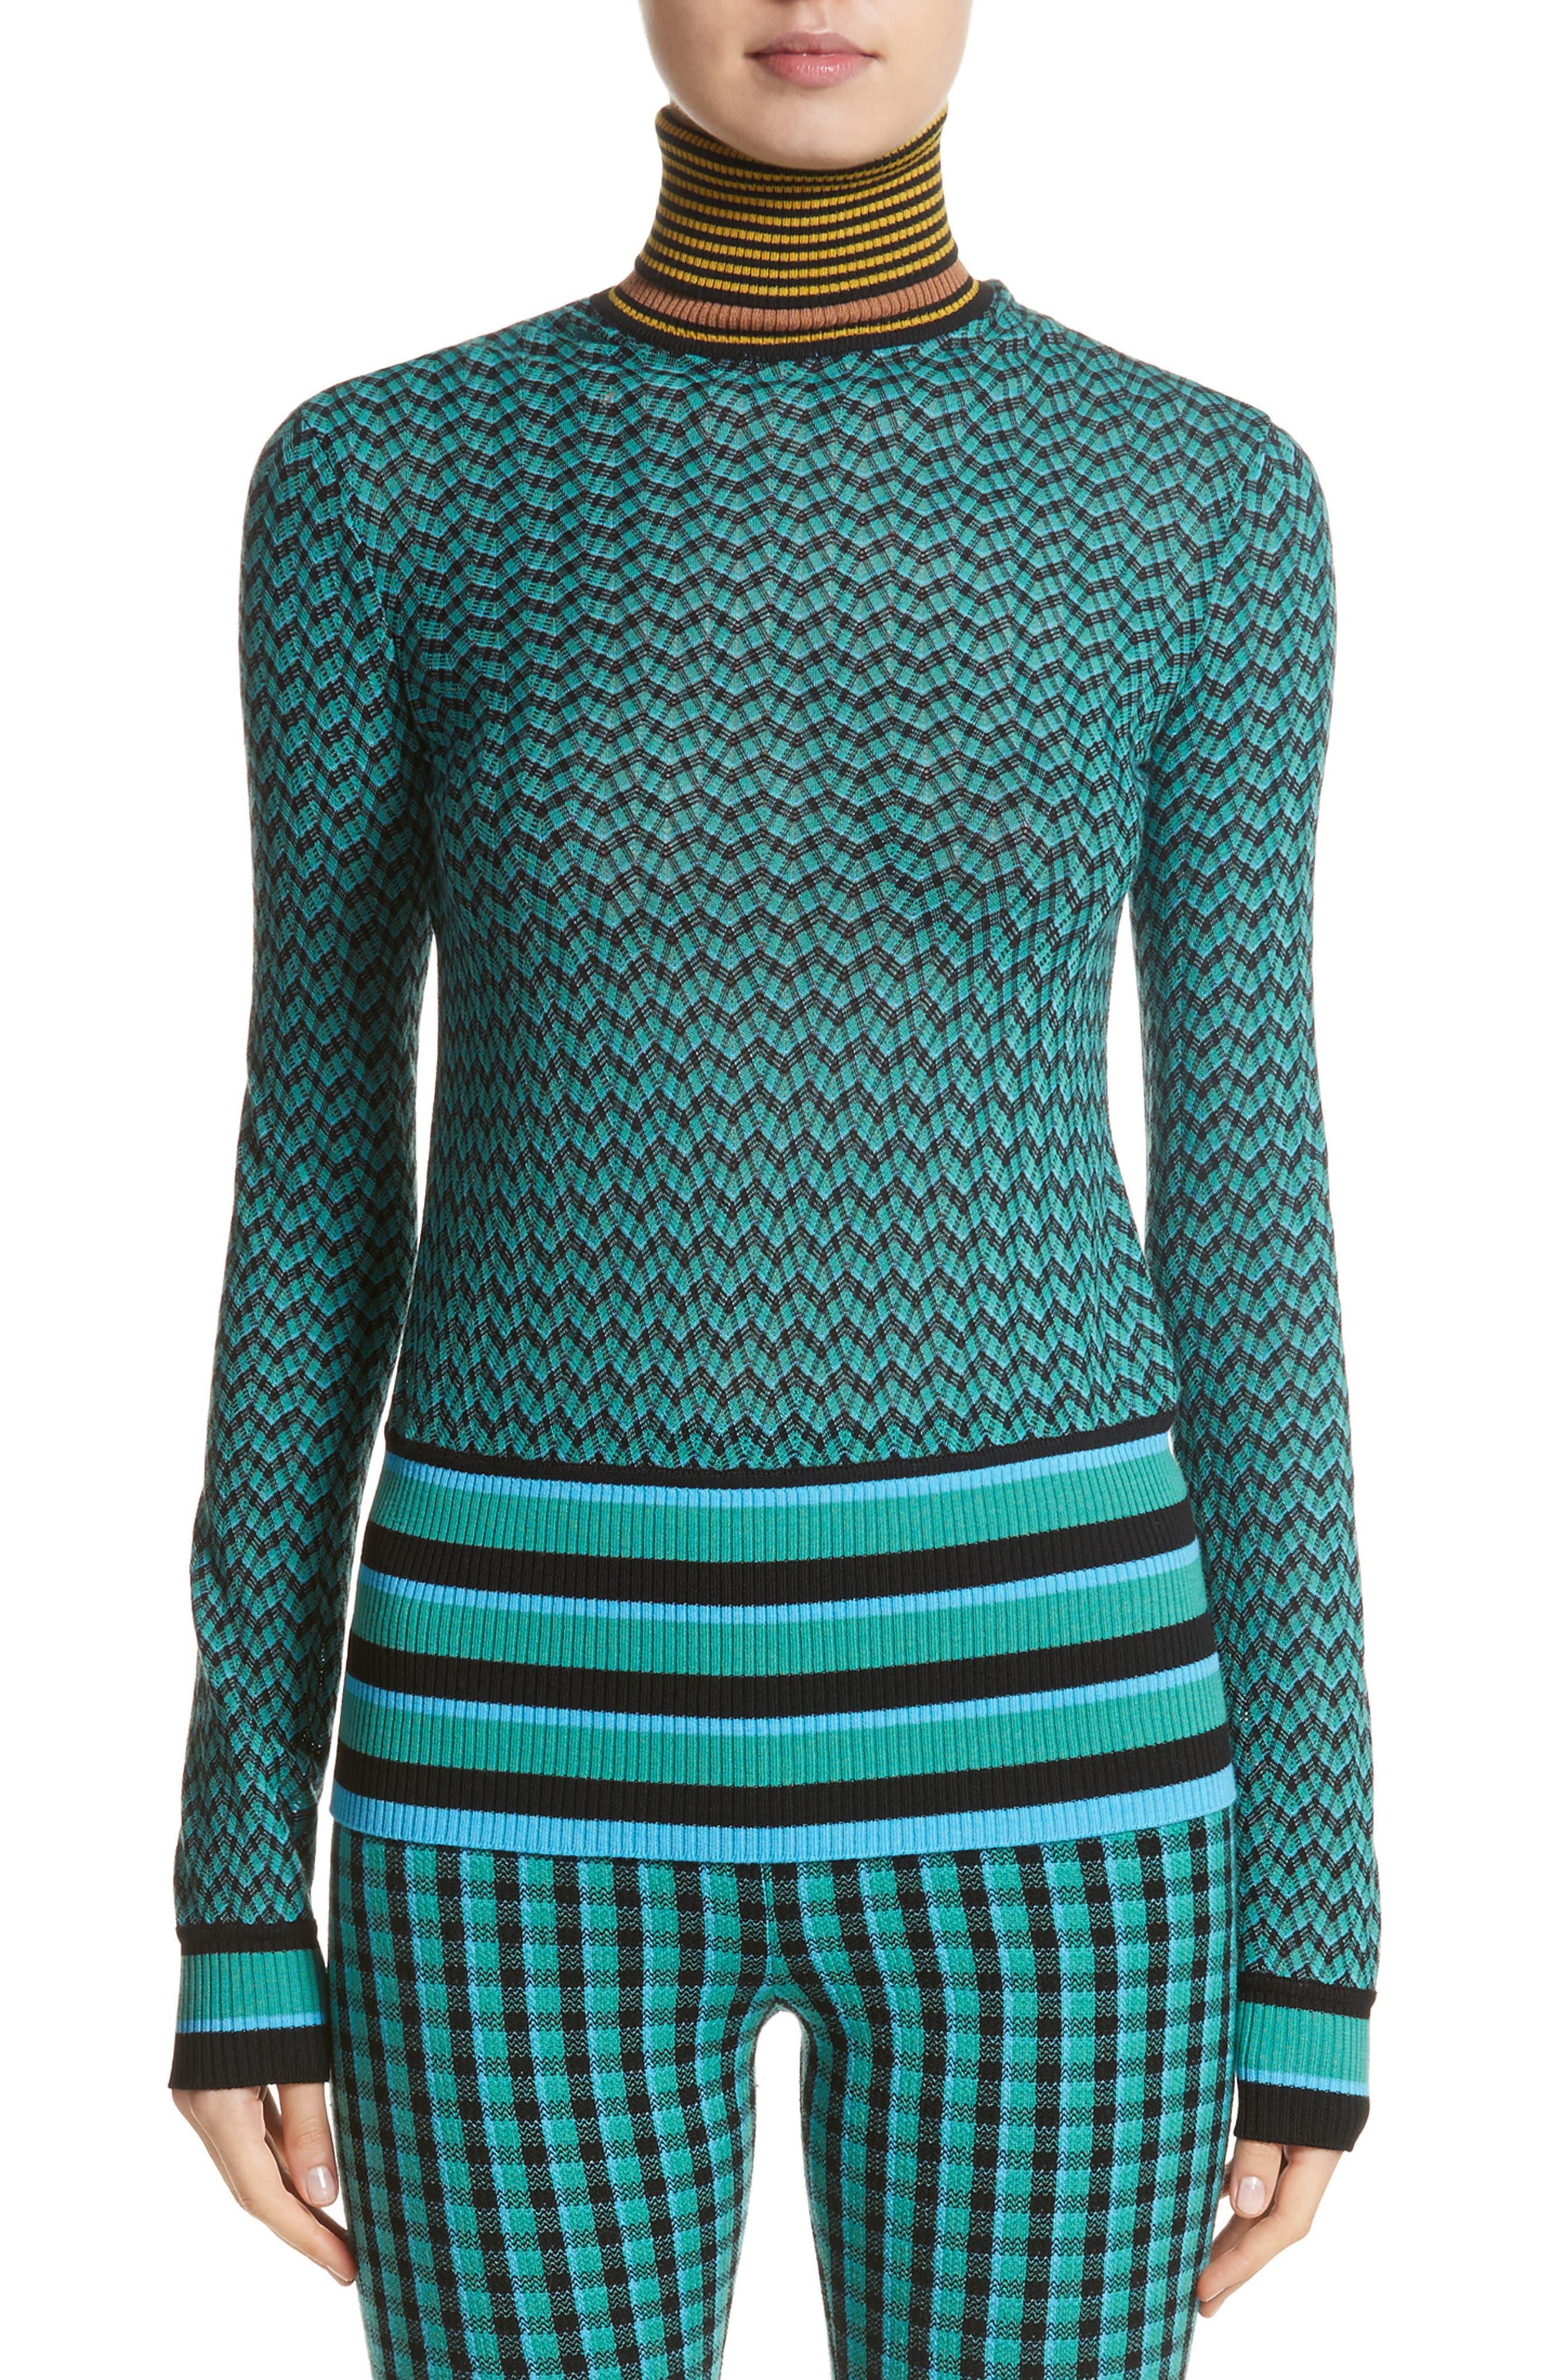 Zigzag & Stripe Mock Neck Sweater,                             Main thumbnail 1, color,                             440